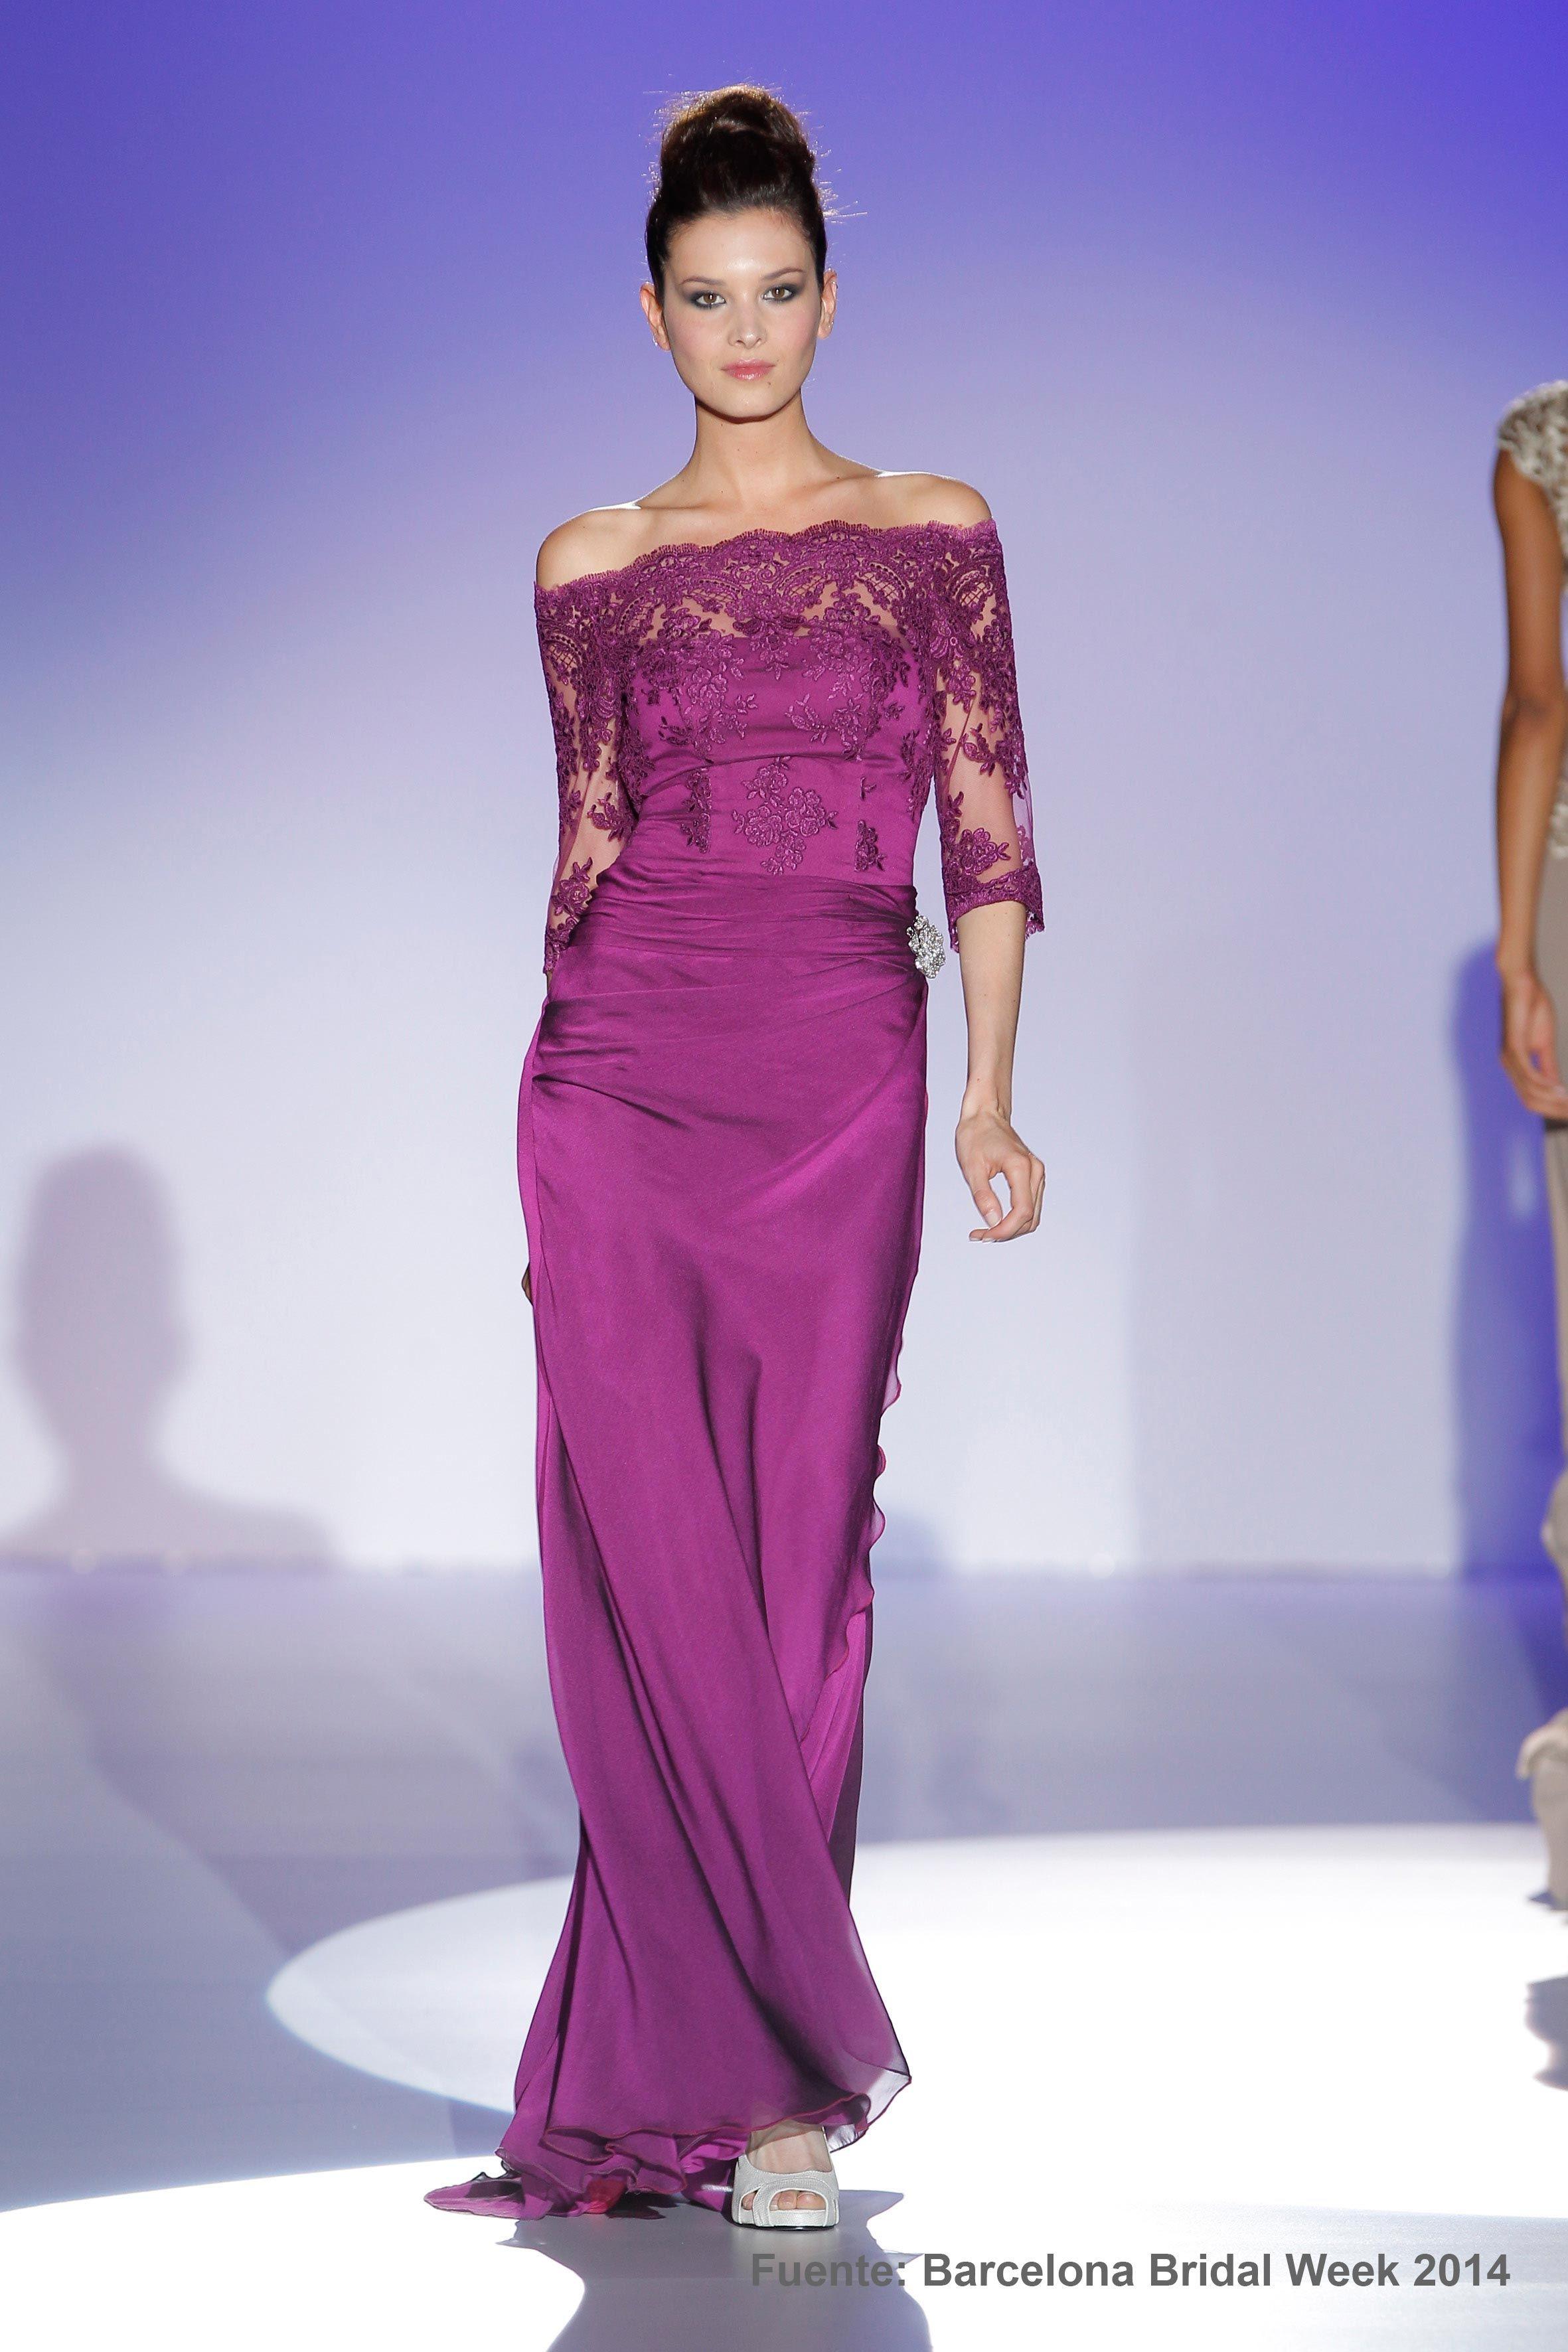 Dorable Vestido De Novia De Escote Festoneado Ornamento - Ideas de ...